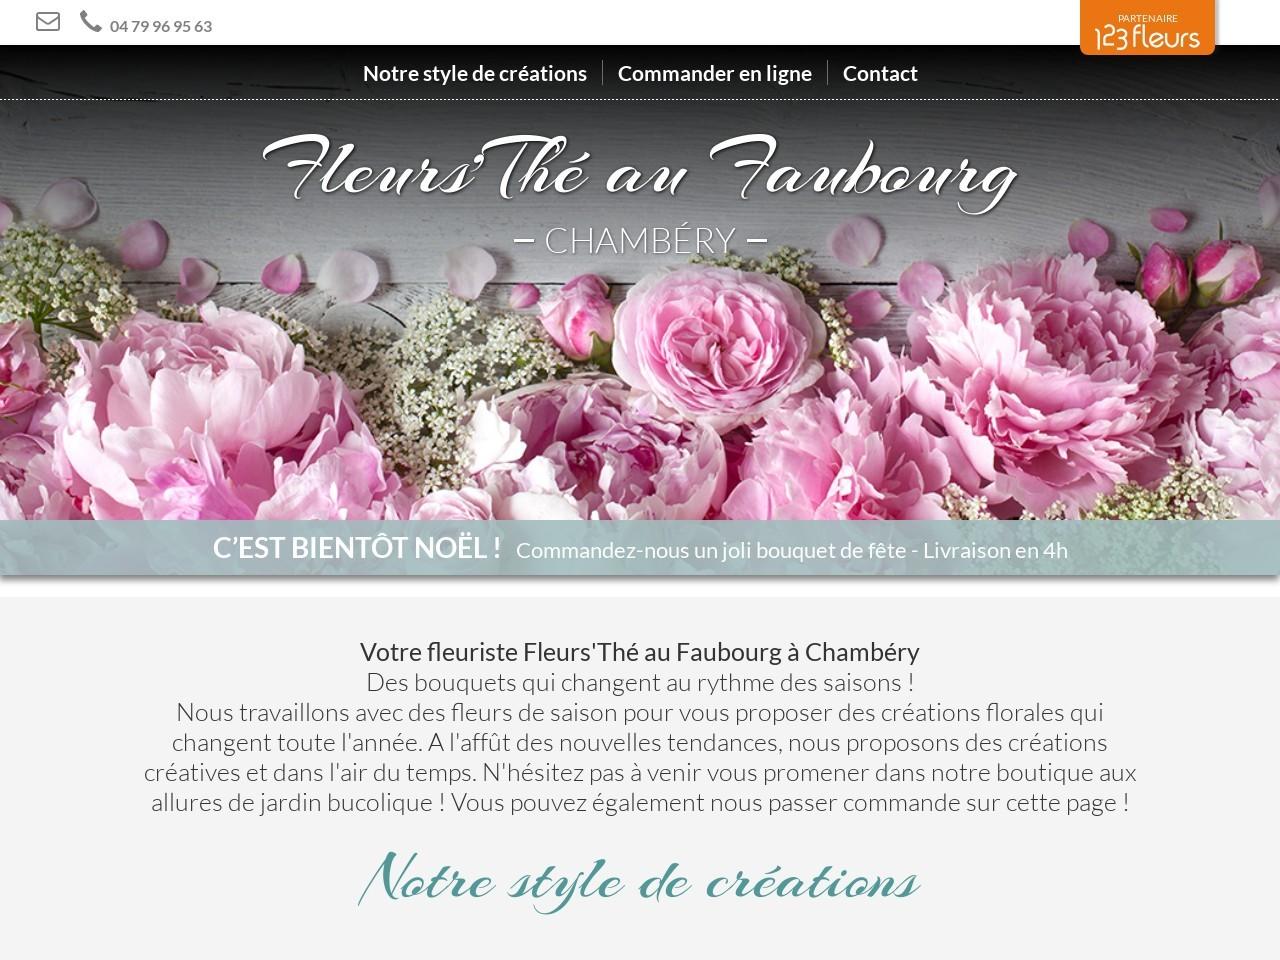 Site fleuriste Fleurs au Faubourg - 123fleurs